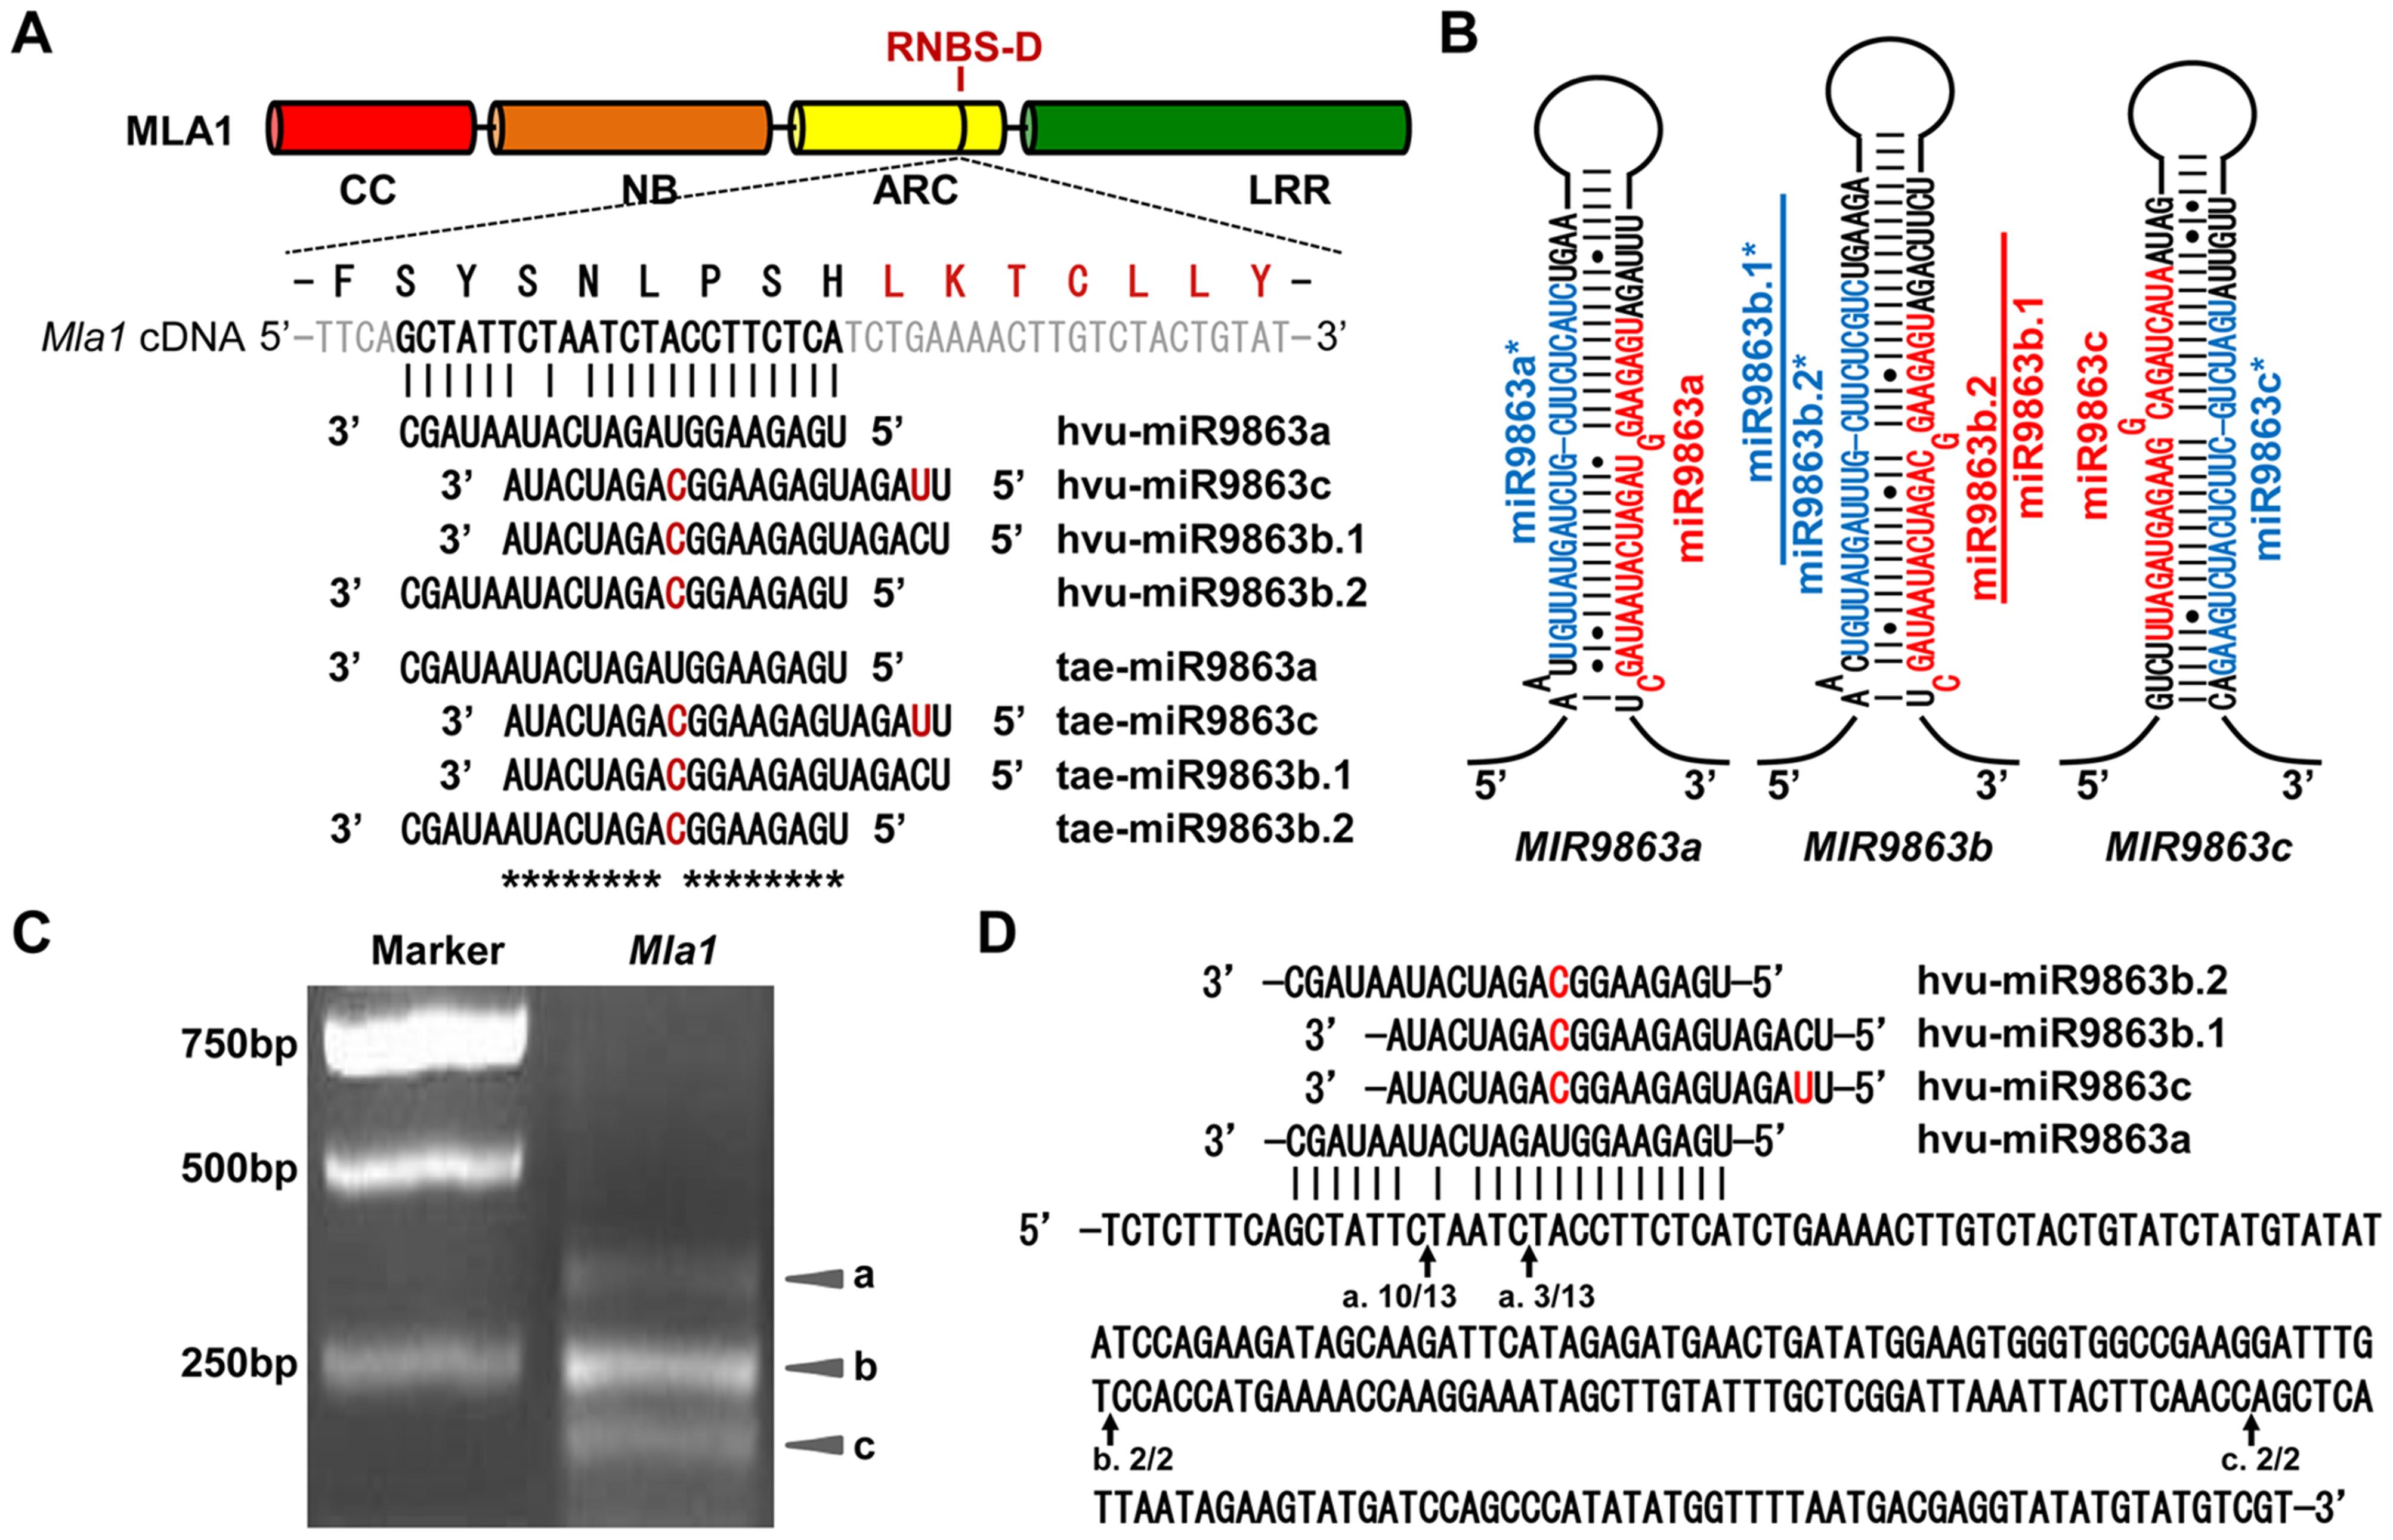 miR9863 family members target <i>Mla1</i> transcripts in barley.